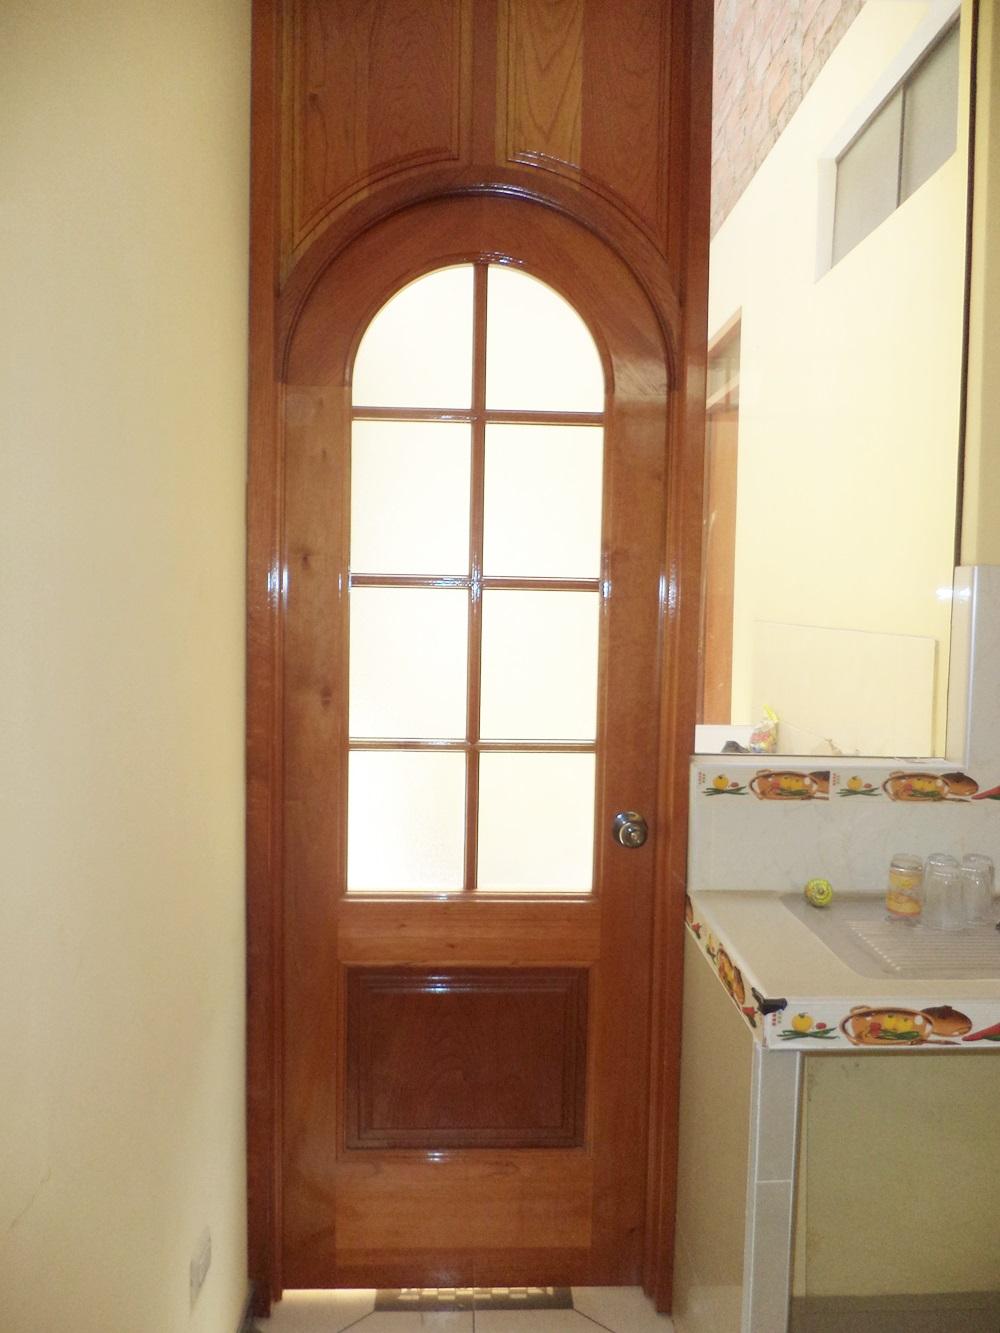 Puerta de madera para cocina en san borja carpintero en lima for Puertas vaiven para cocina